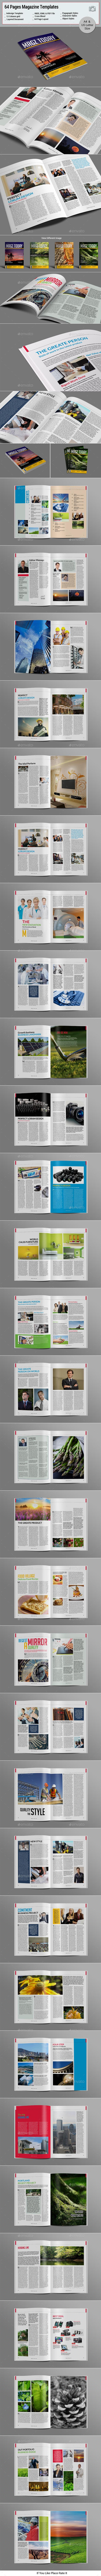 64 Pages Magazine Templates - Magazines Print Templates